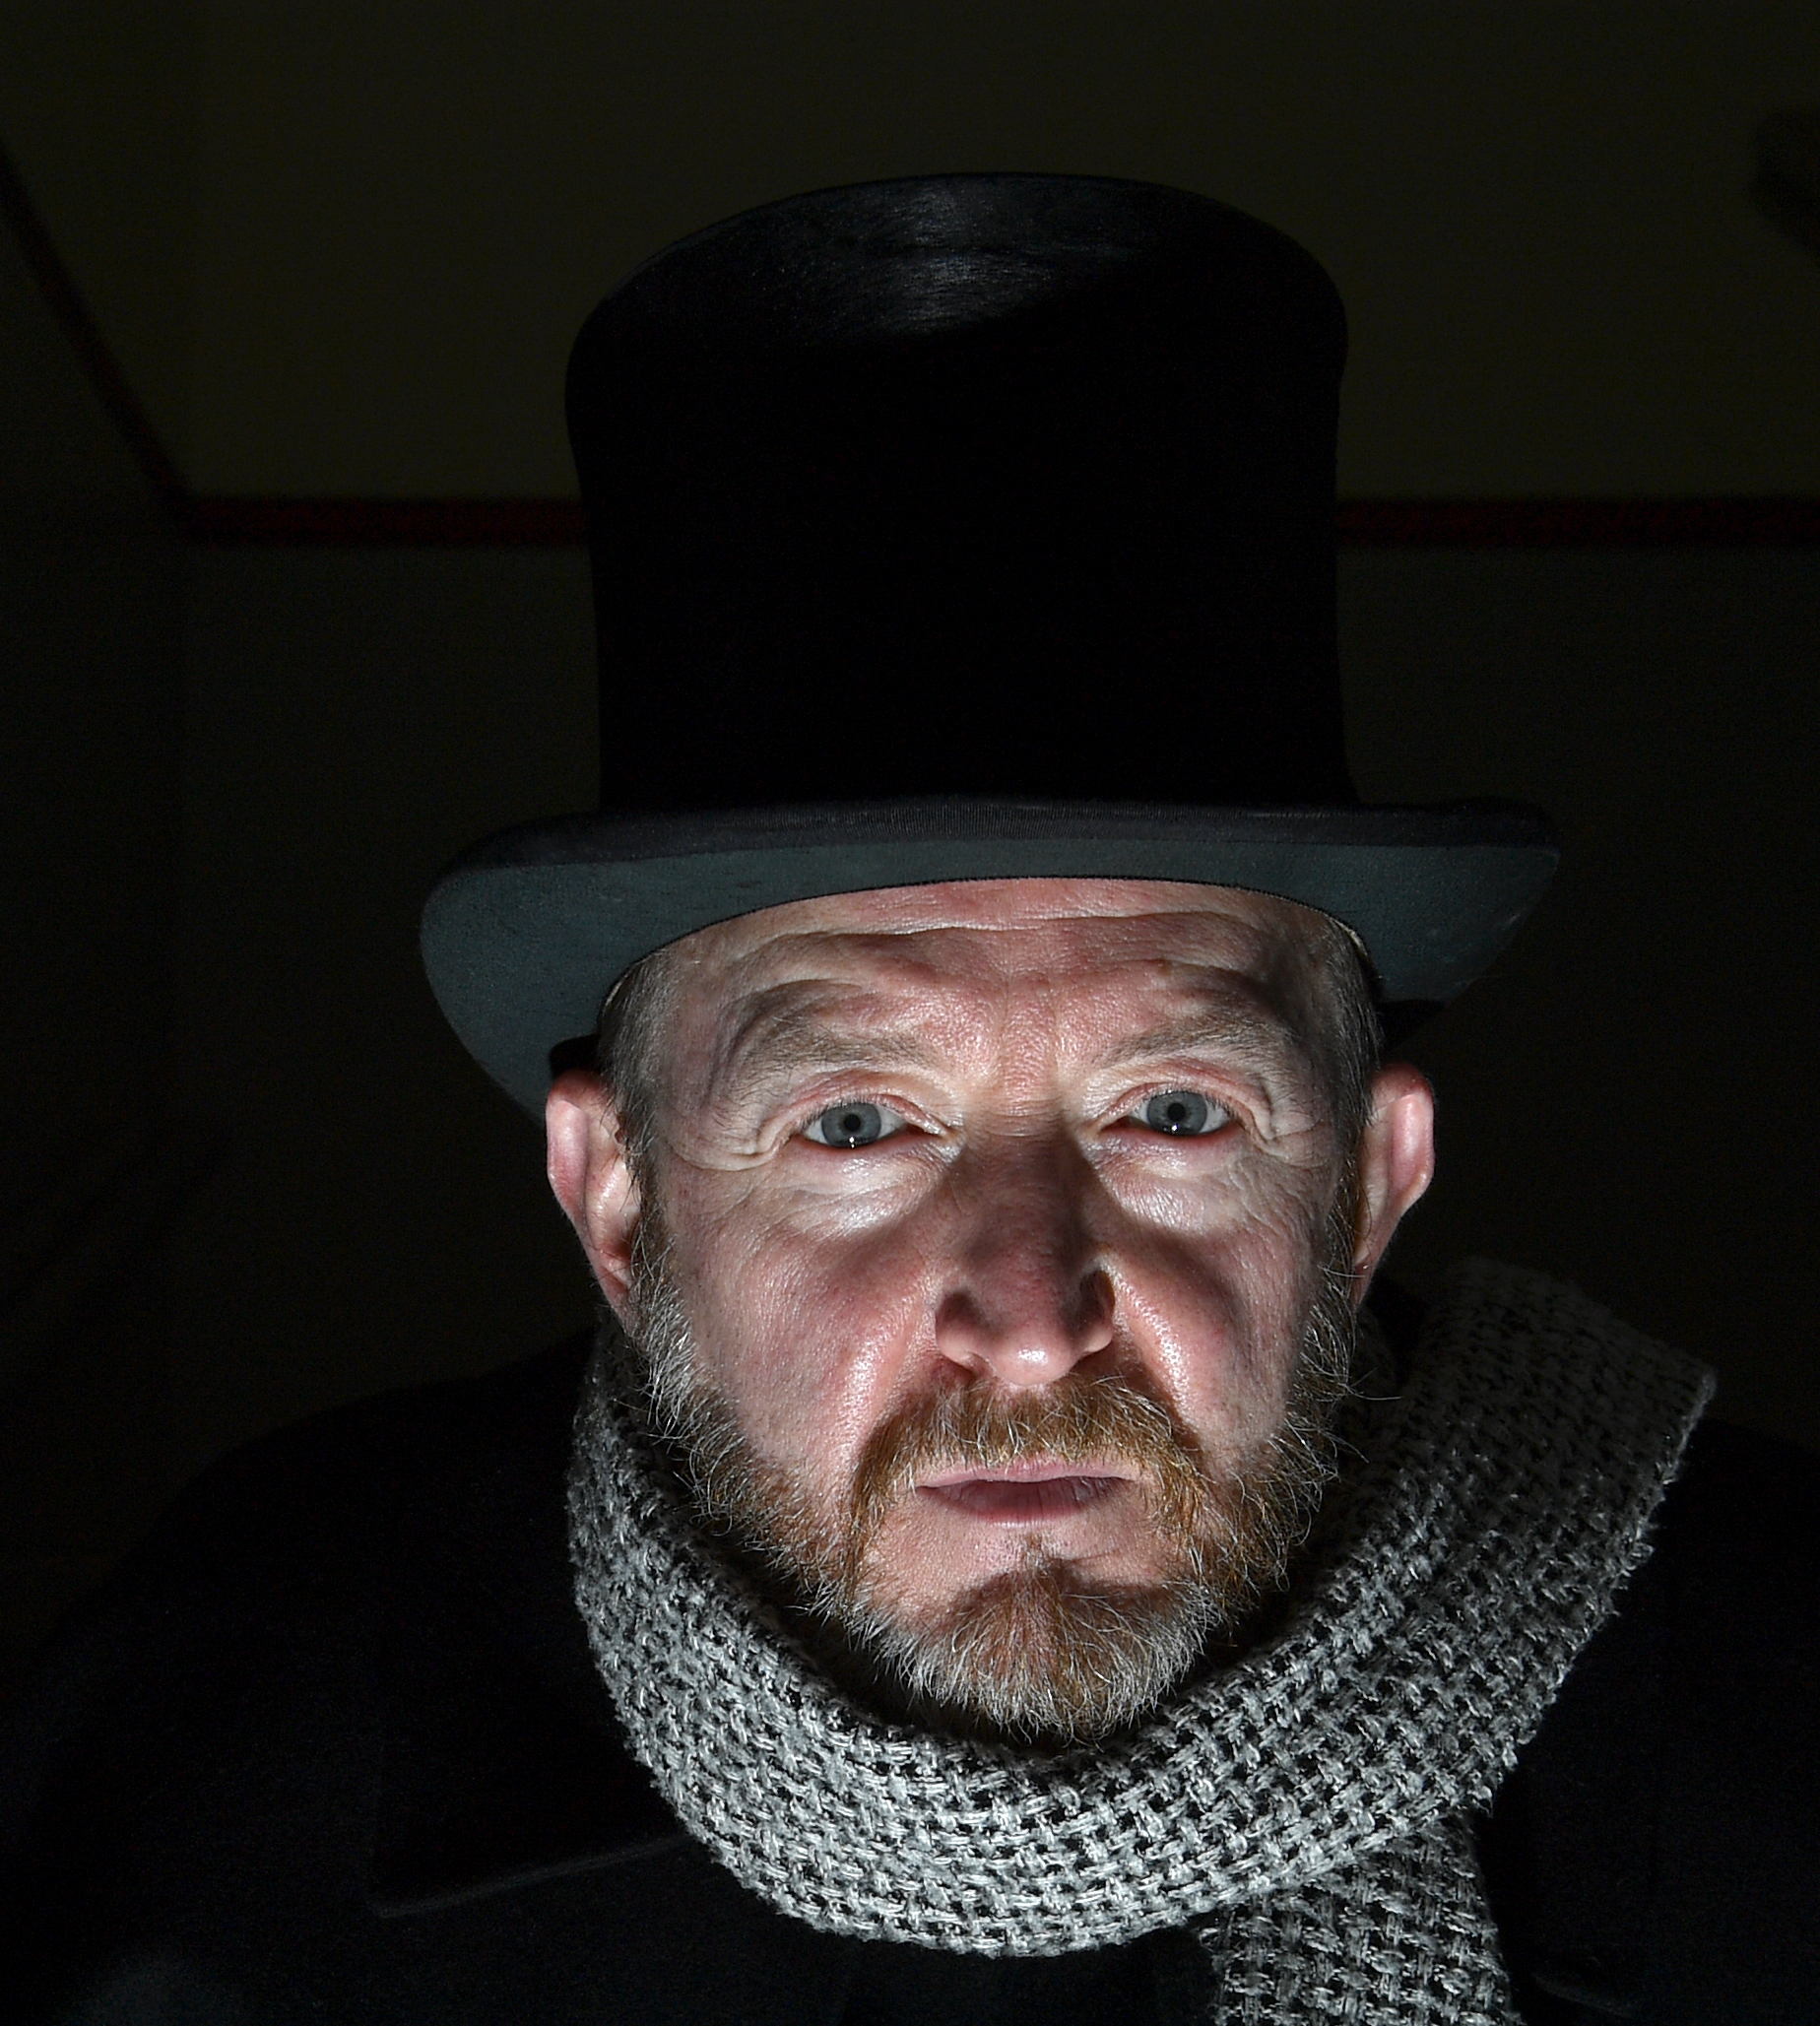 A Christmas Carol comes to Keswick theatre - no humbug - News & Star